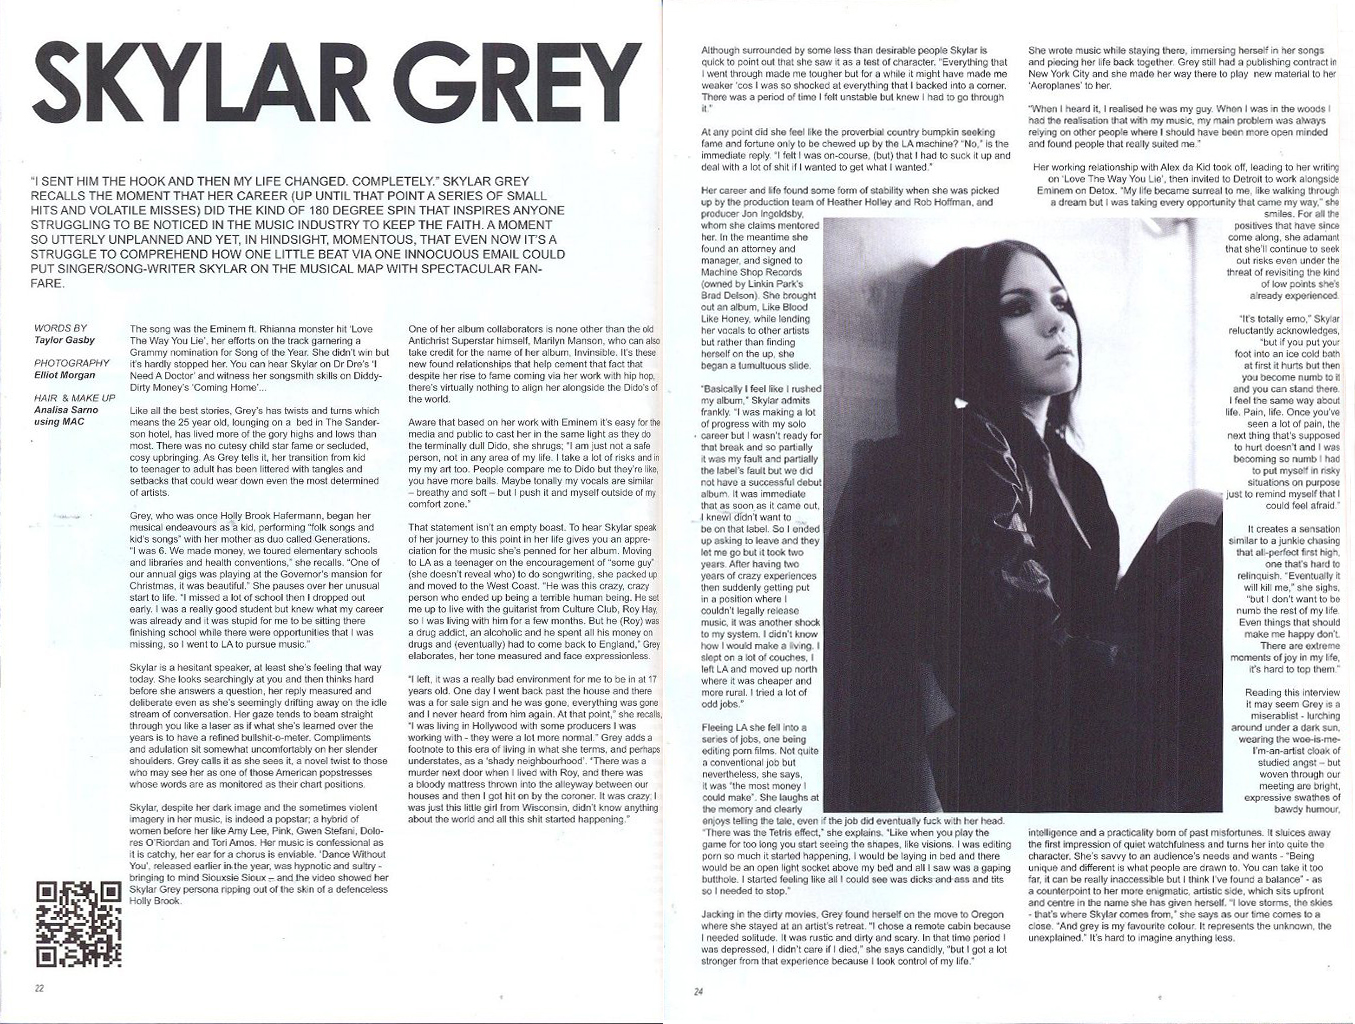 SkylarGrey-DisorderMagazineOctoberDapperIssue(OCT-2011)-01of03.jpg